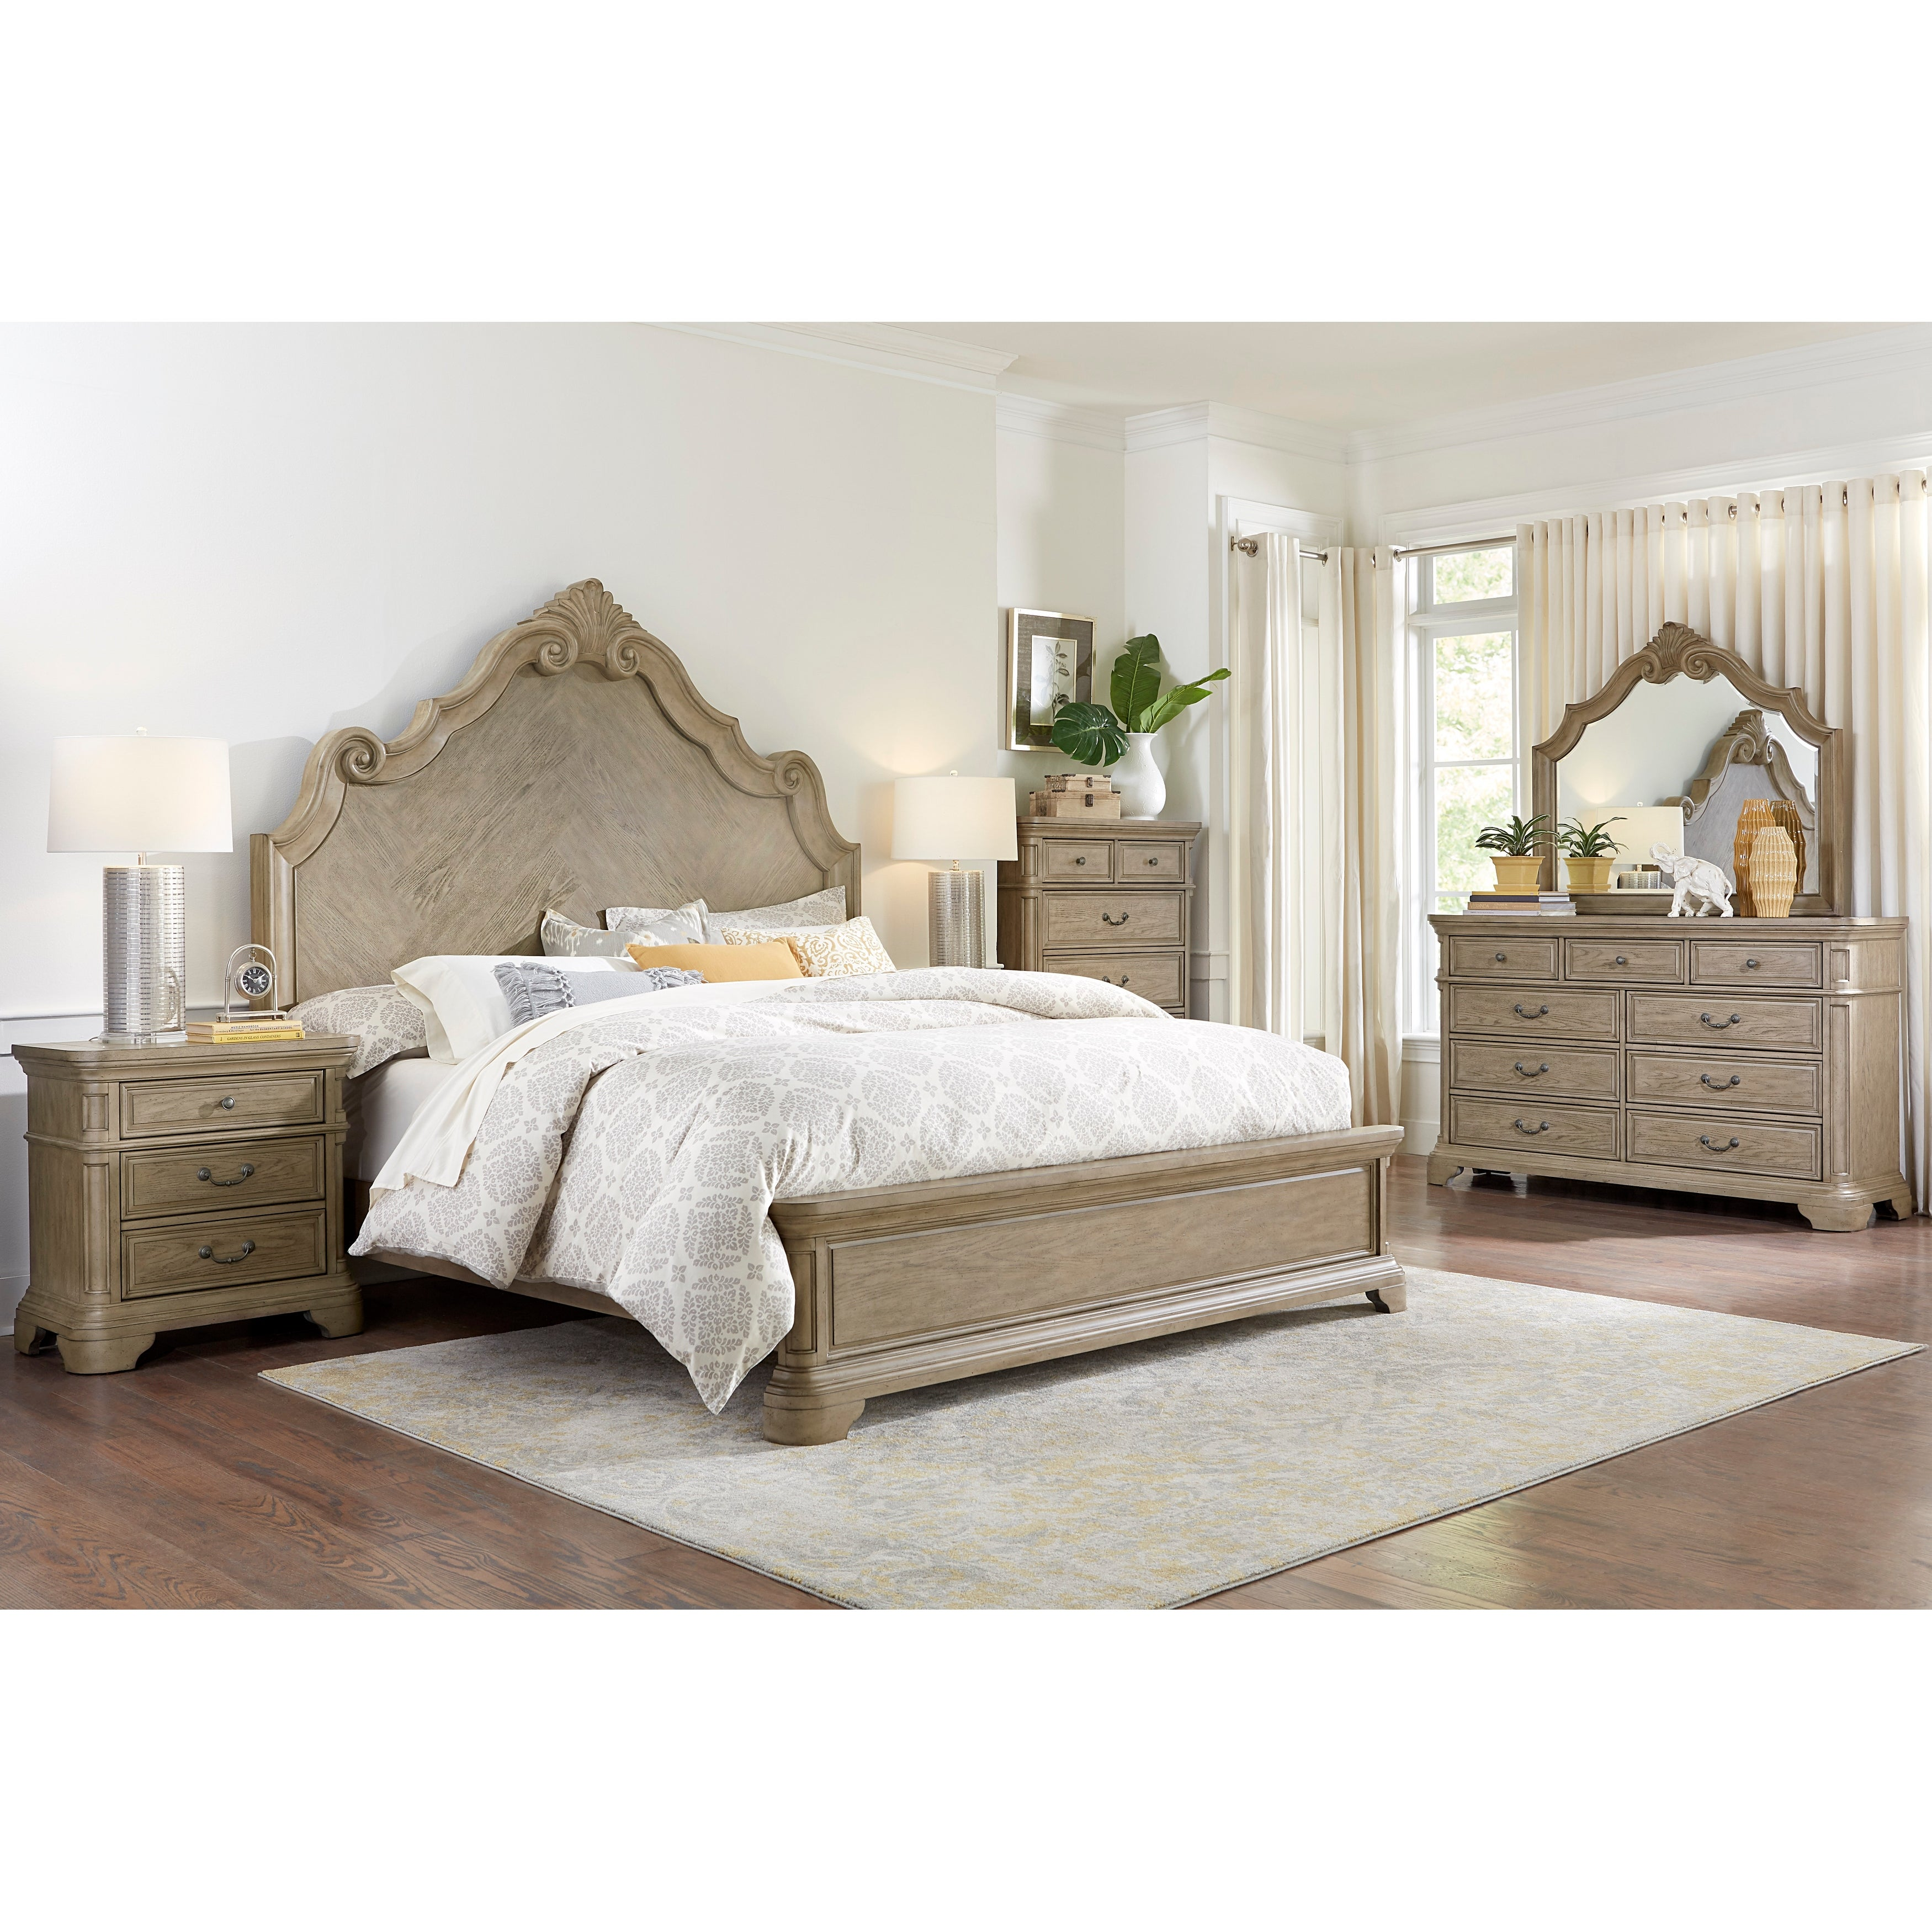 Levan Carved Wood 6 Piece Bedroom Set